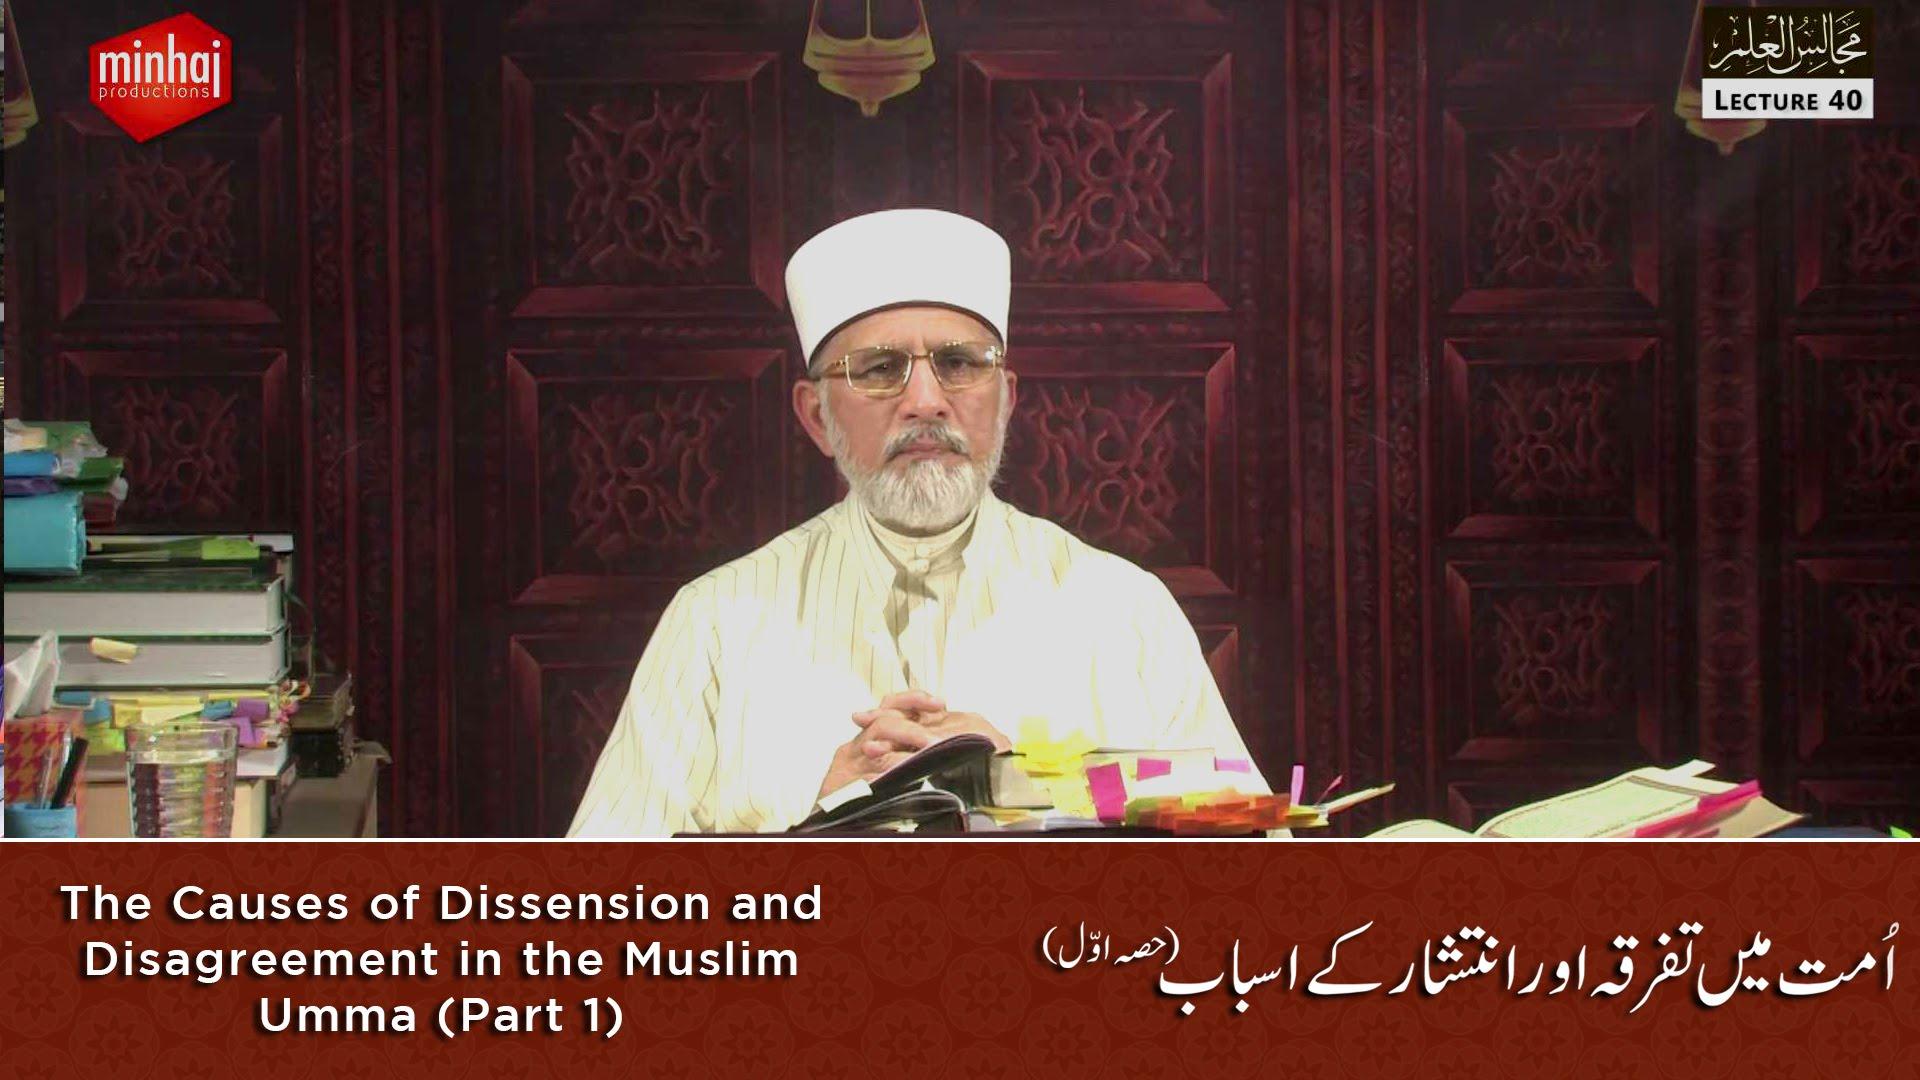 مجالس العلم (لیکچر 40) شیخ الاسلام ڈاکٹر محمد طاہرالقادری